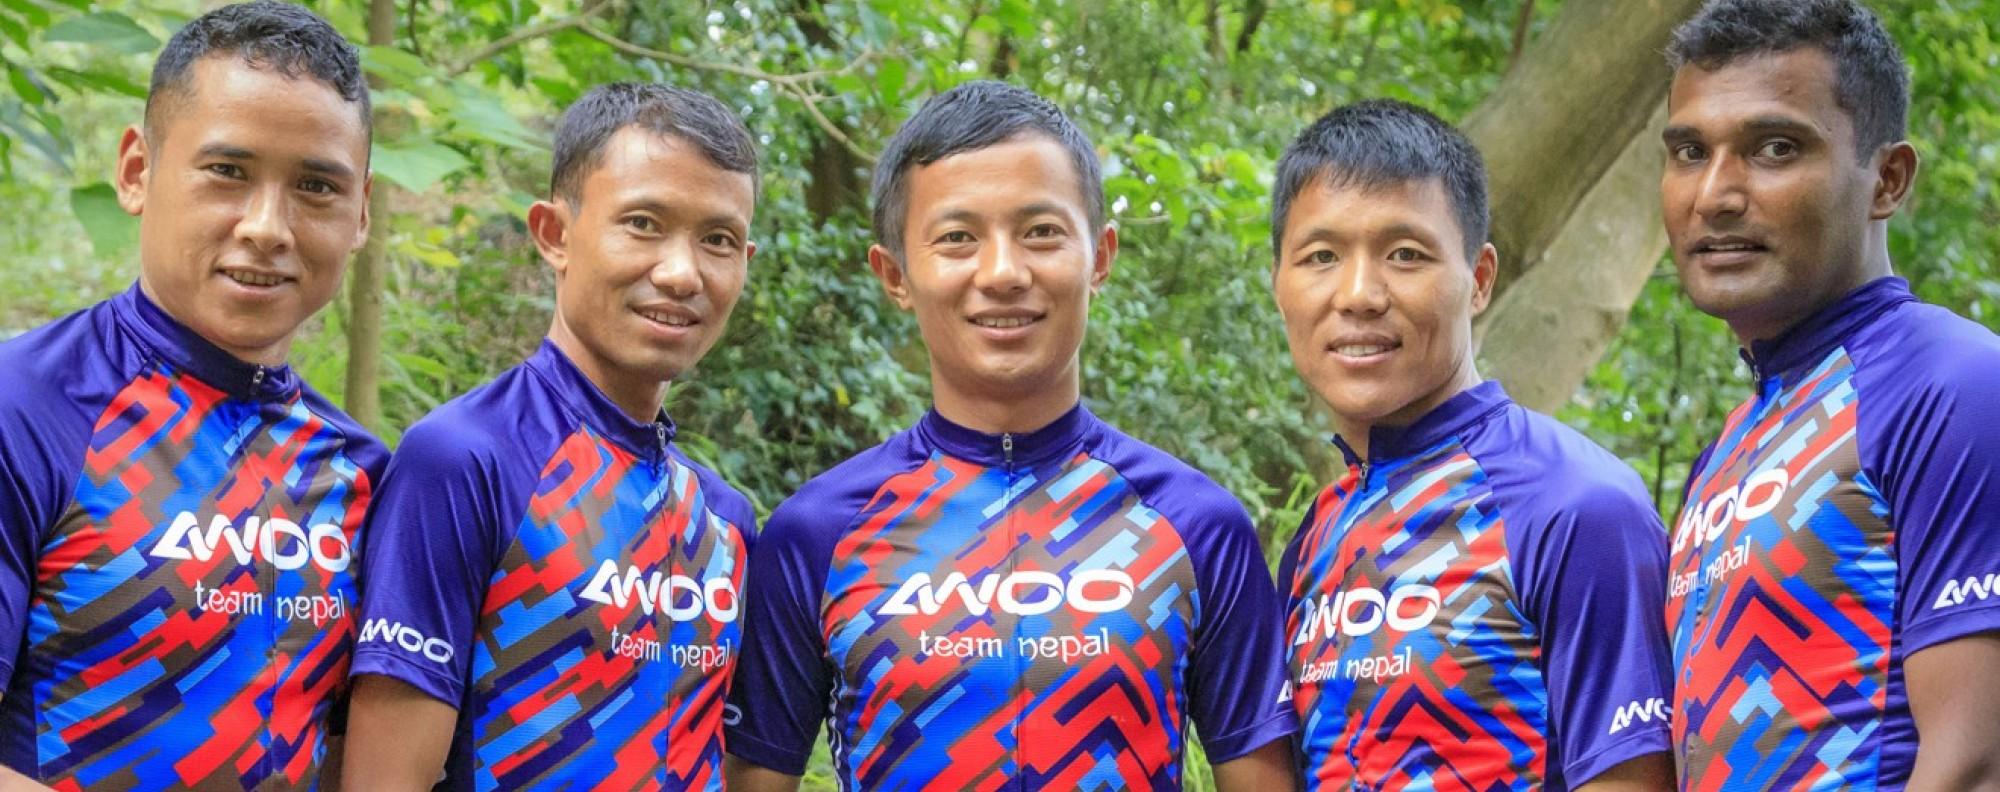 AWOO Team Nepal